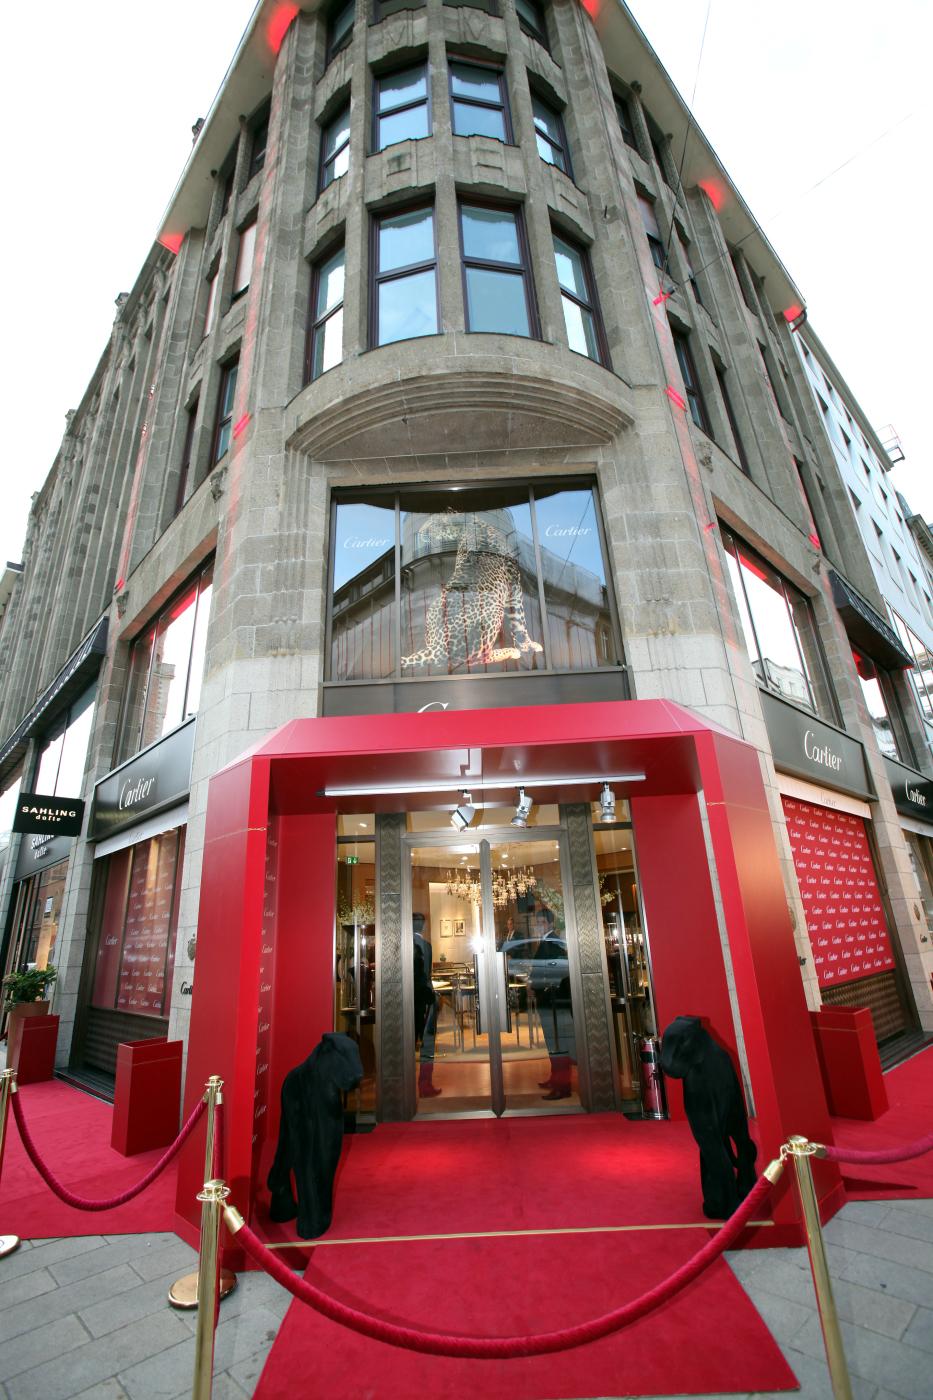 cartier hamburg die cartier boutique erstrahlt in neuem. Black Bedroom Furniture Sets. Home Design Ideas